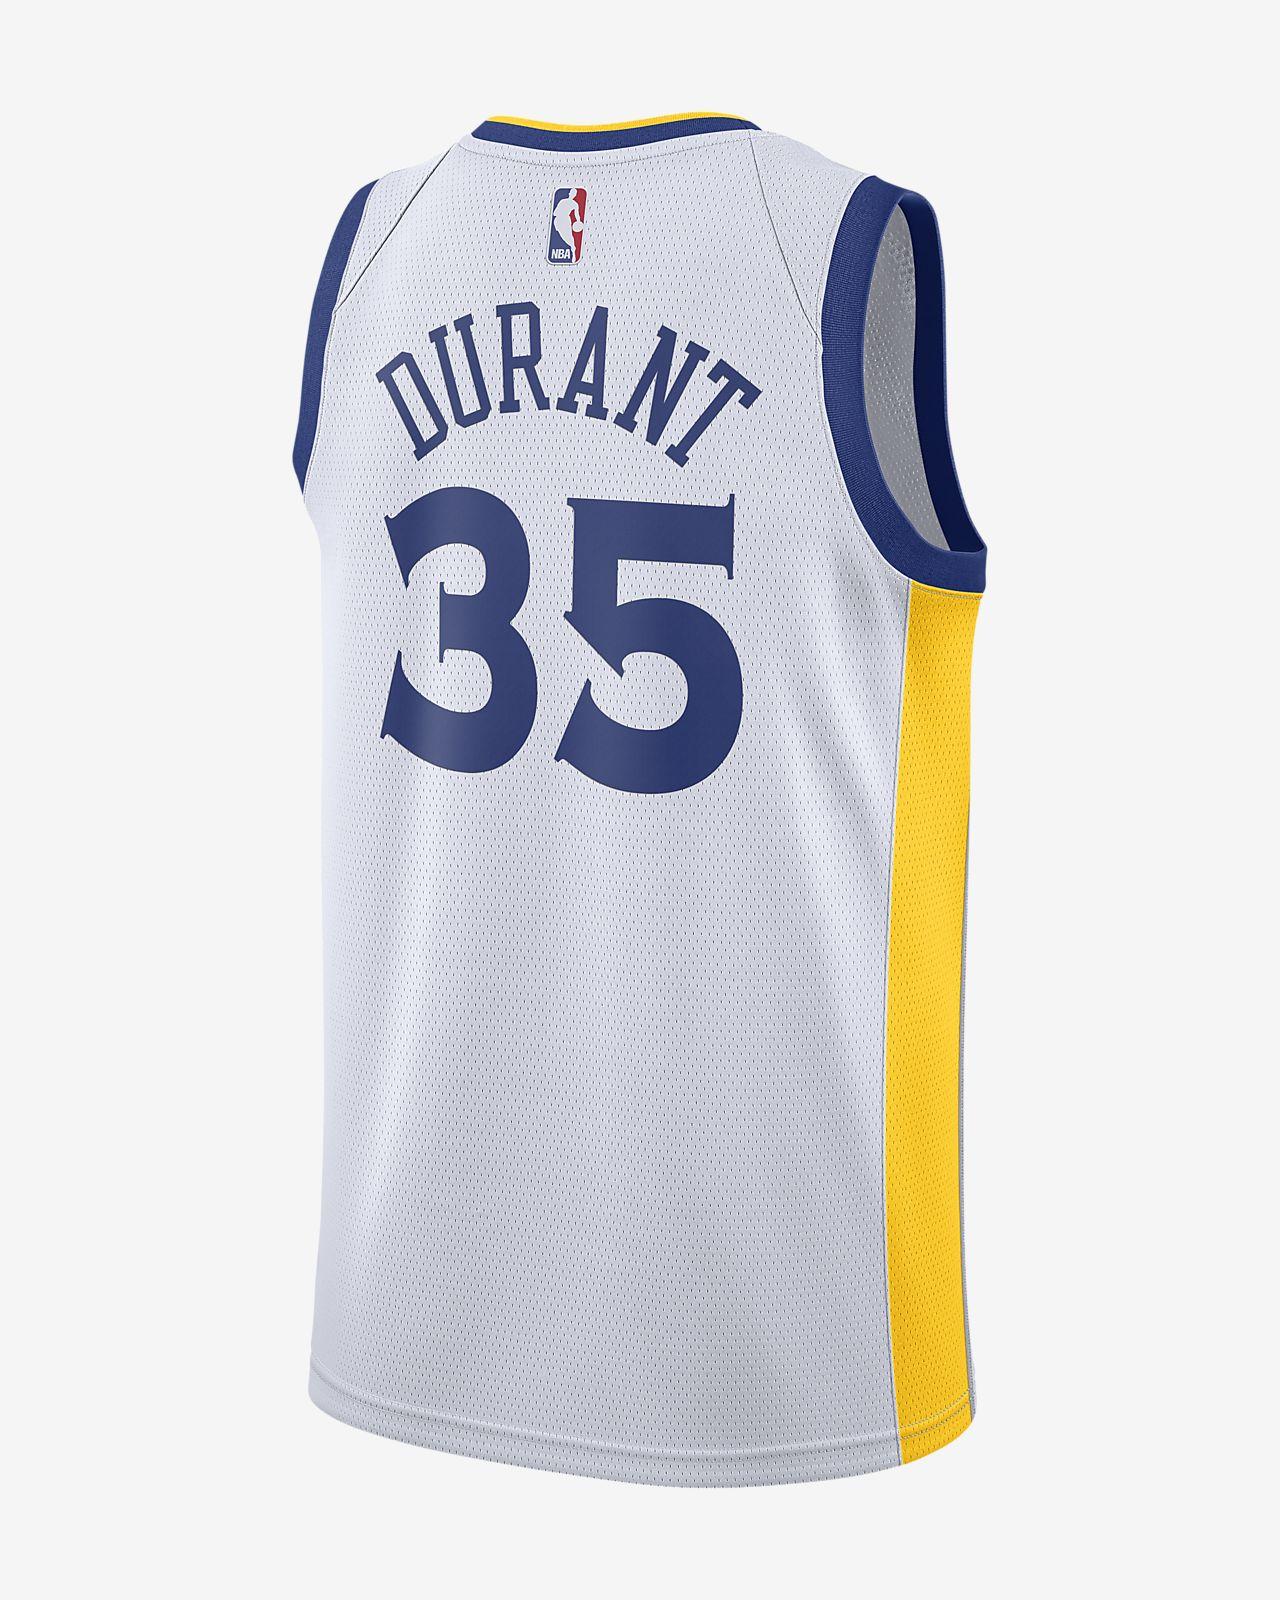 73ed14395d5af ... Maillot connecté Nike NBA Kevin Durant Association Edition Swingman (Golden  State Warriors) pour Homme